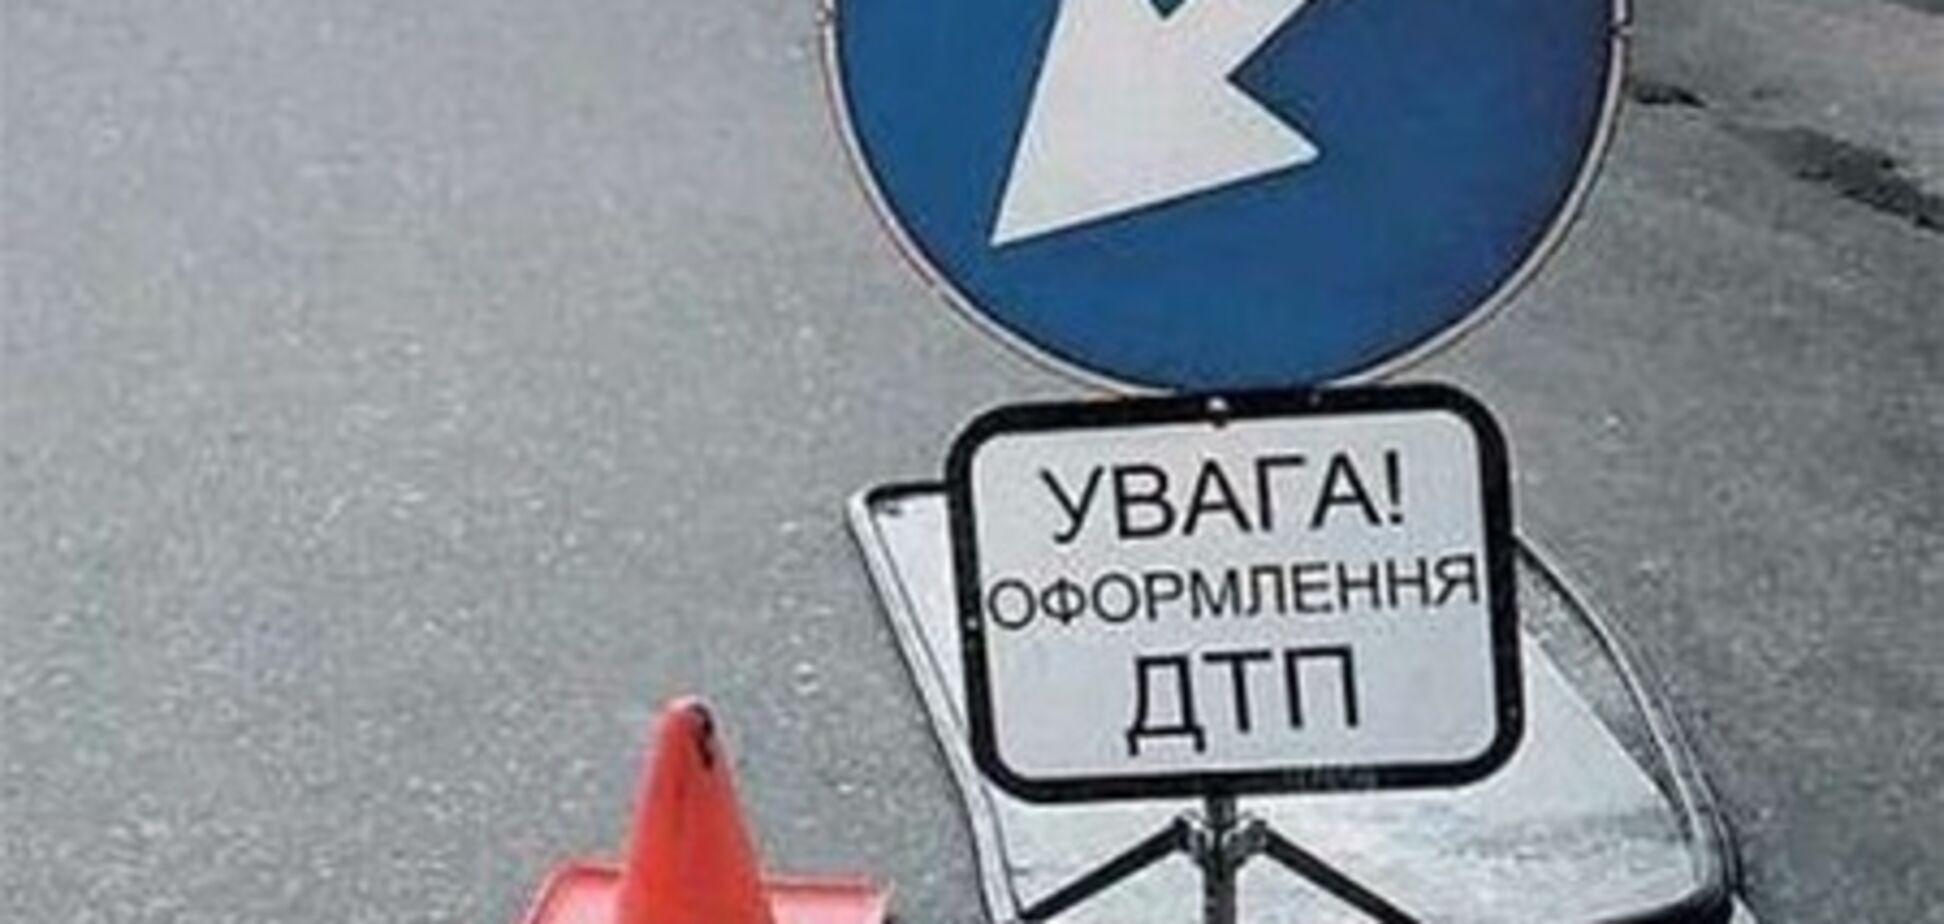 У МВС заперечують участь дочки генерала в ДТП з авто депутата